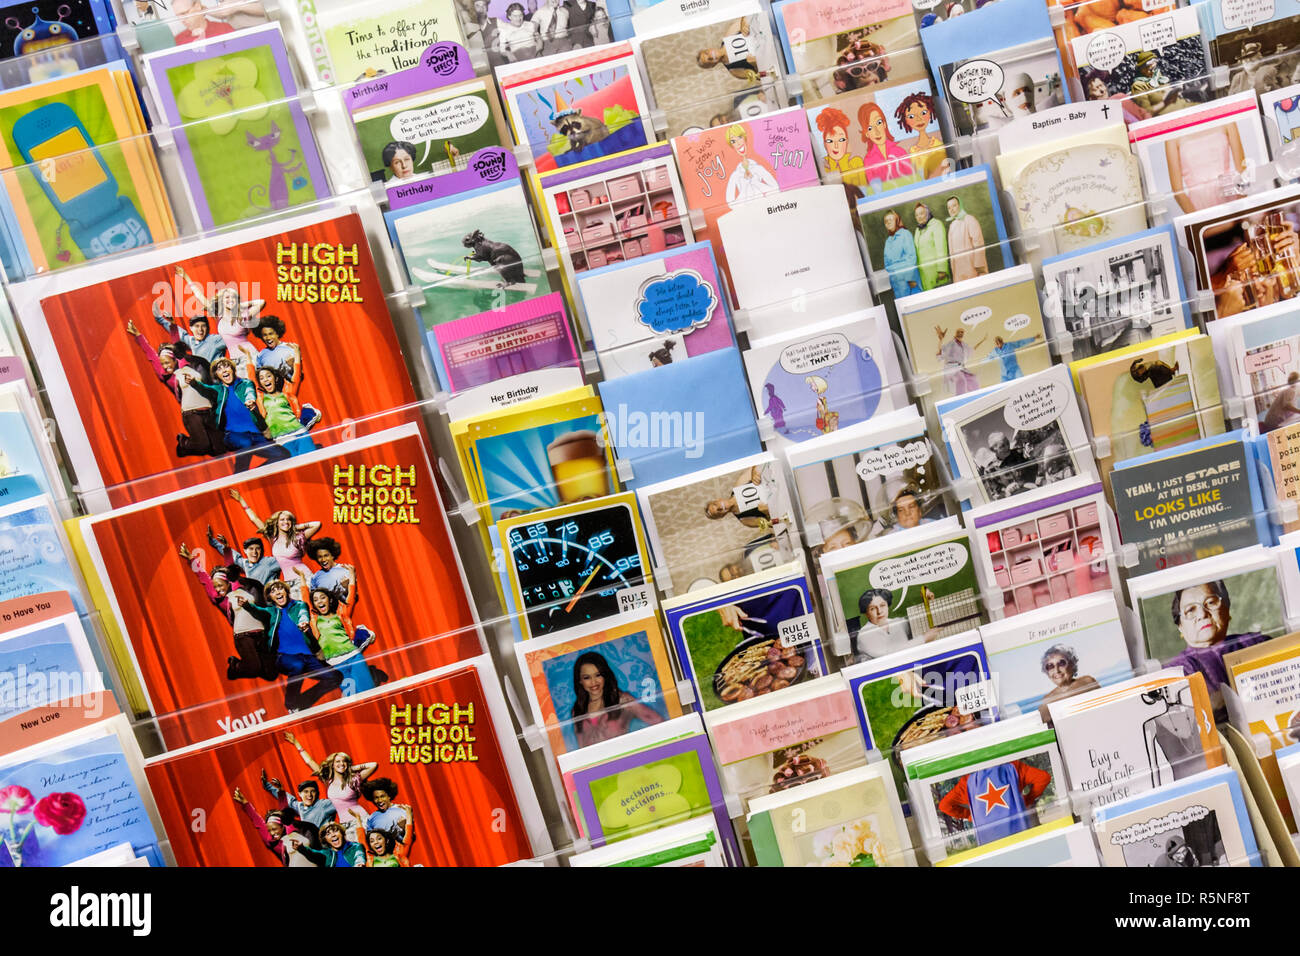 Miami Beach Florida 5th Street CVS Pharmacy Drug Store Shelf Retail Product Display Marketing Greeting Card